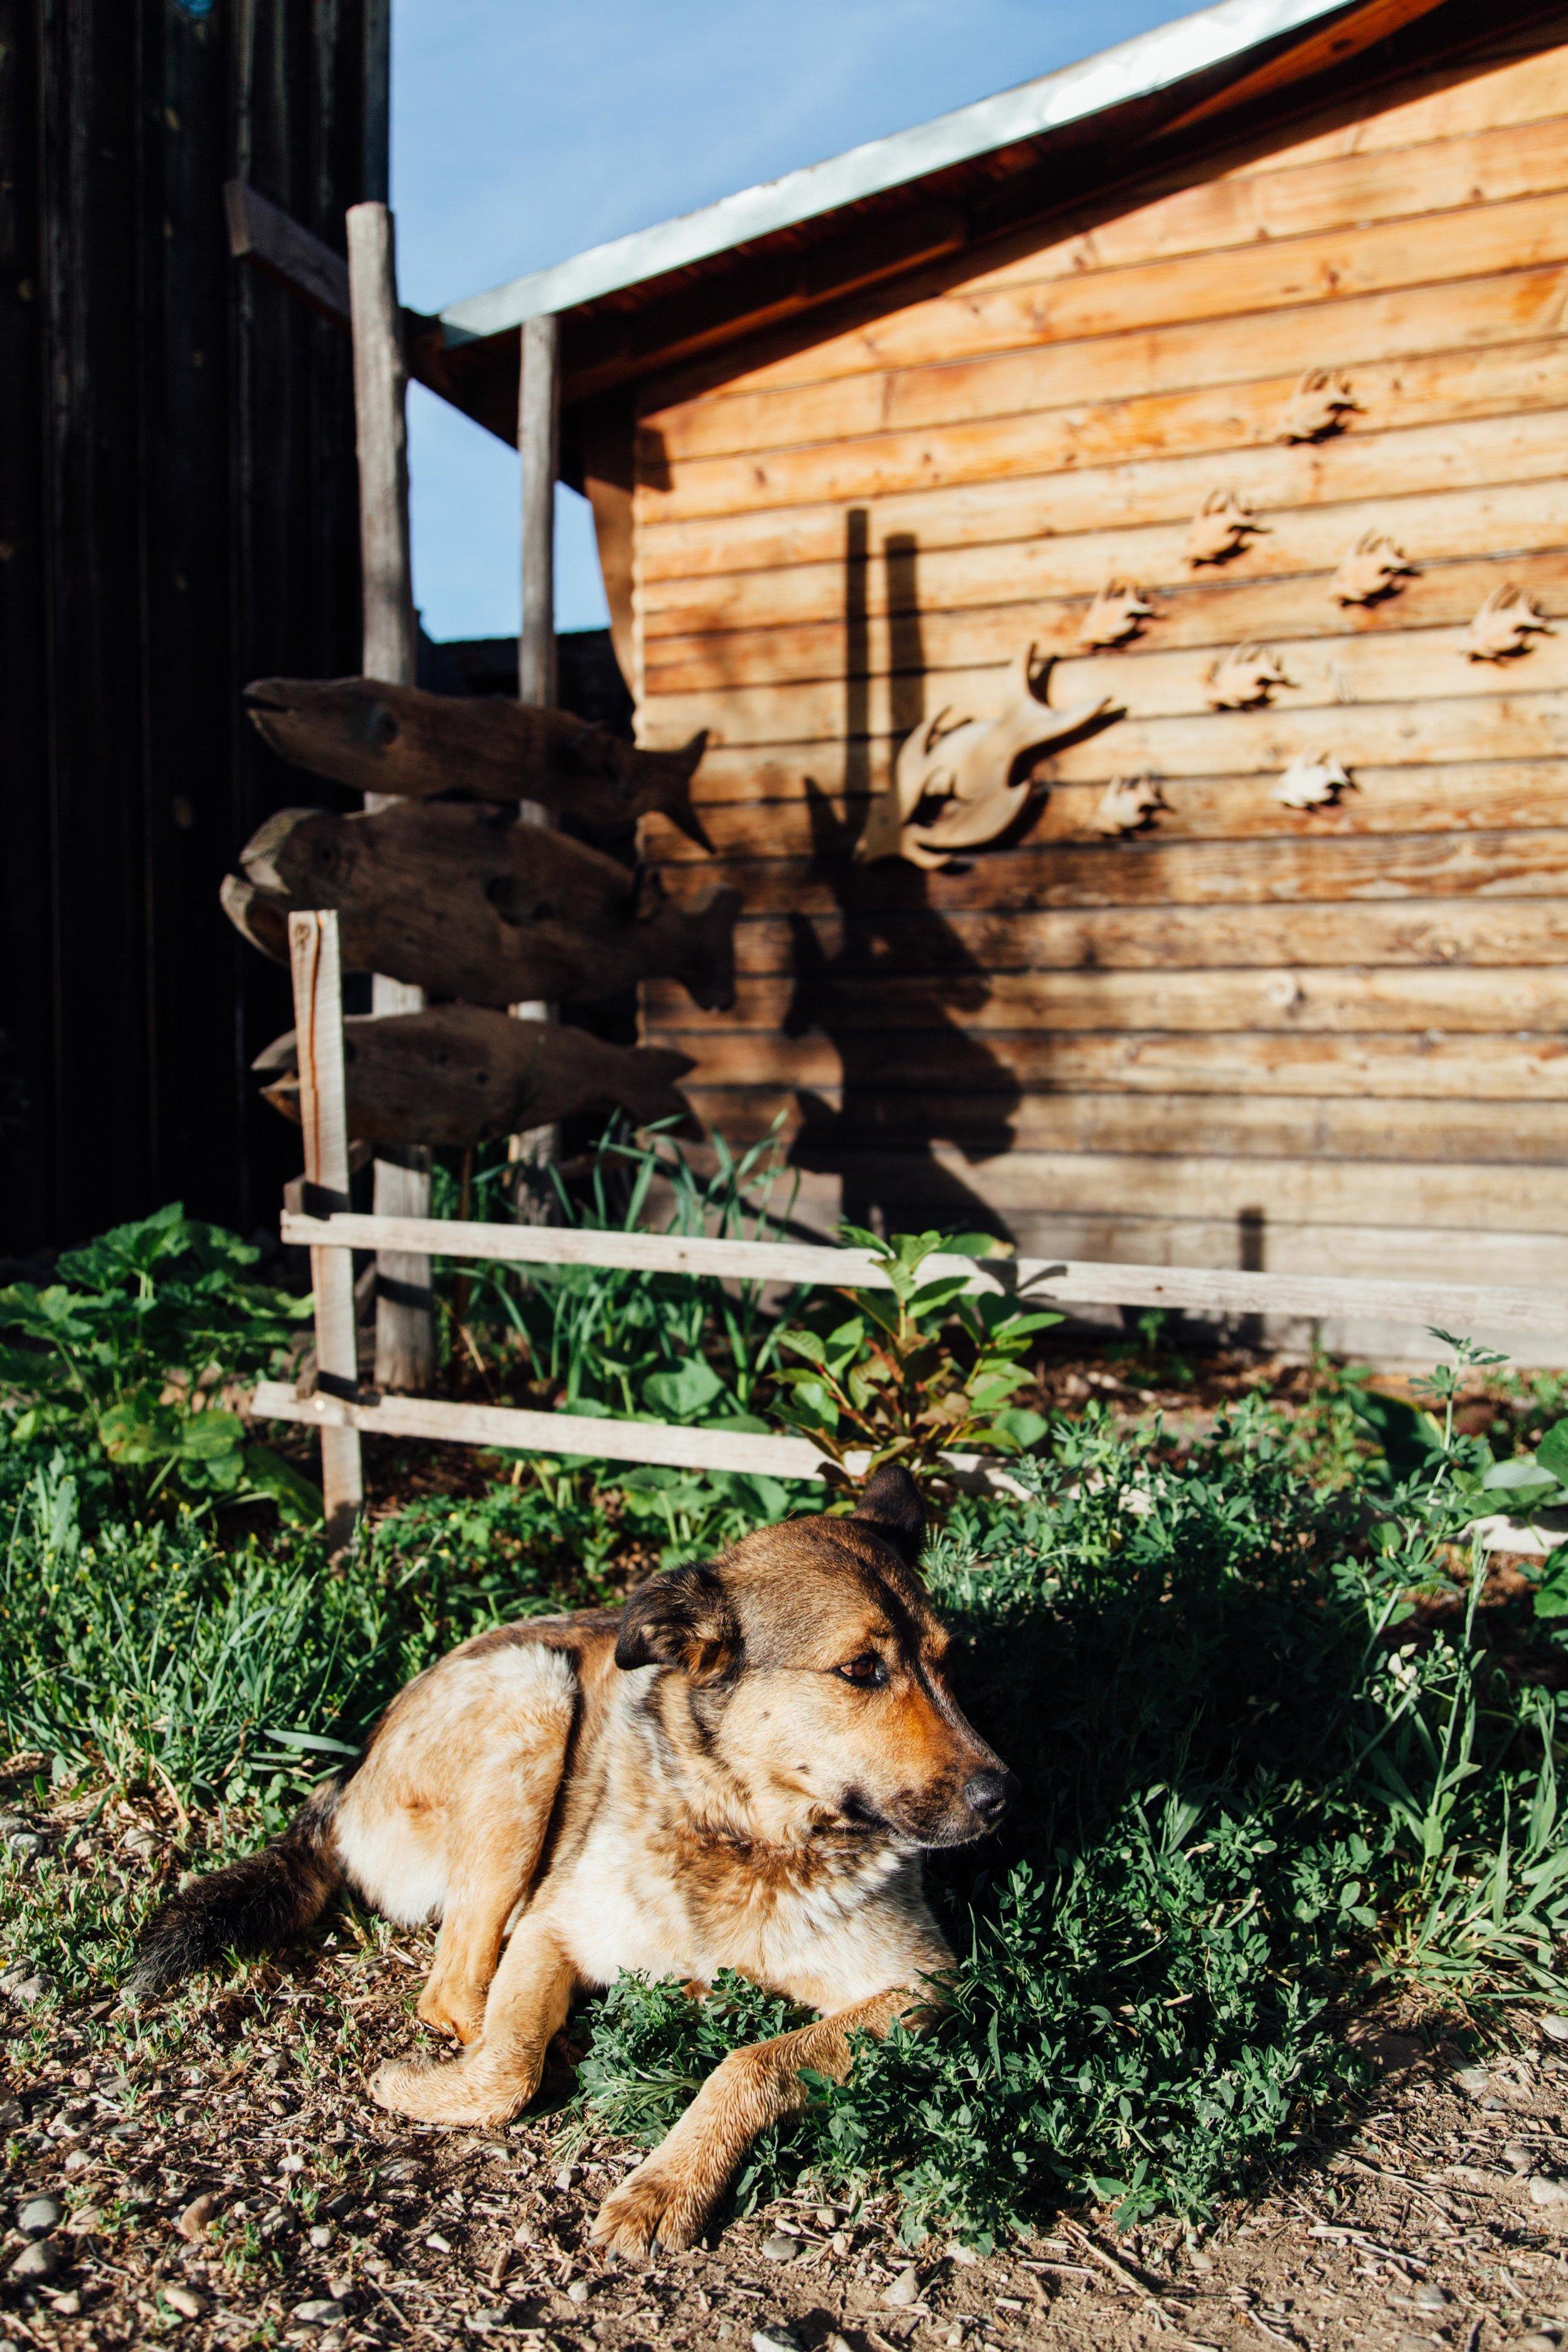 Taos_Emily_14.jpg